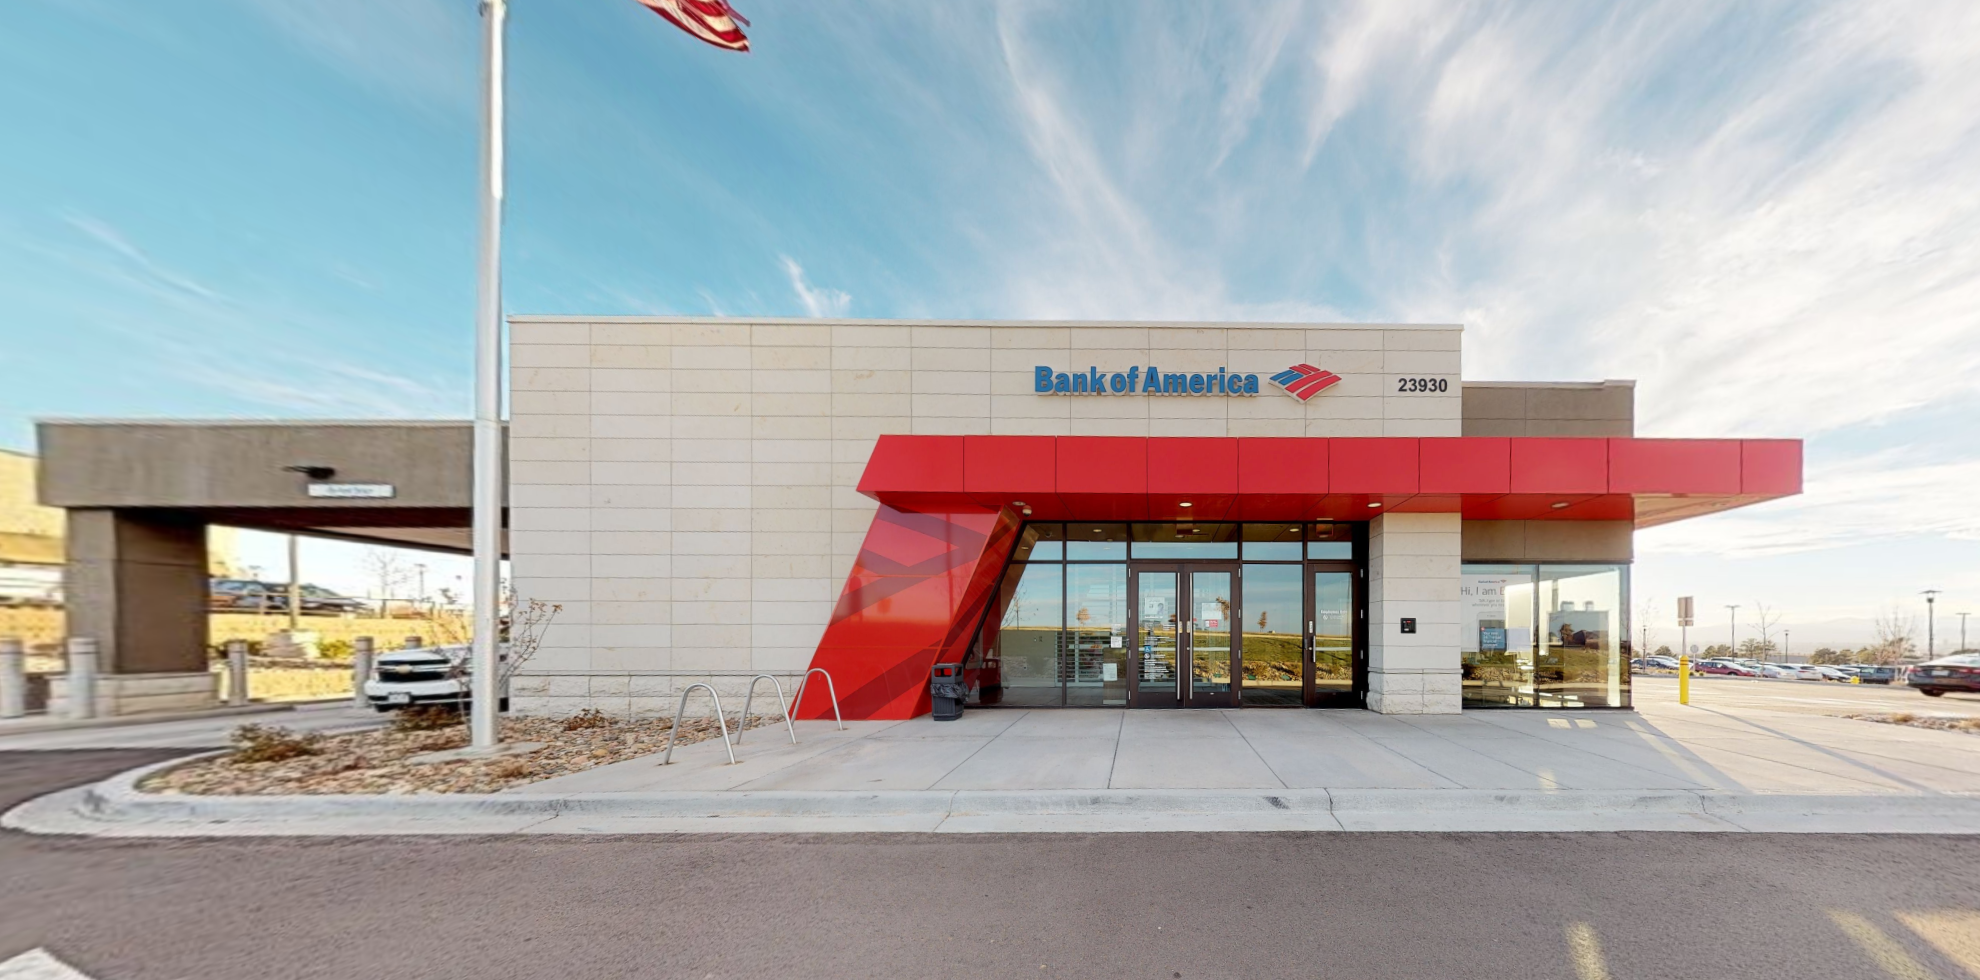 Bank of America financial center with drive-thru ATM   23930 E Smoky Hill Rd, Aurora, CO 80016